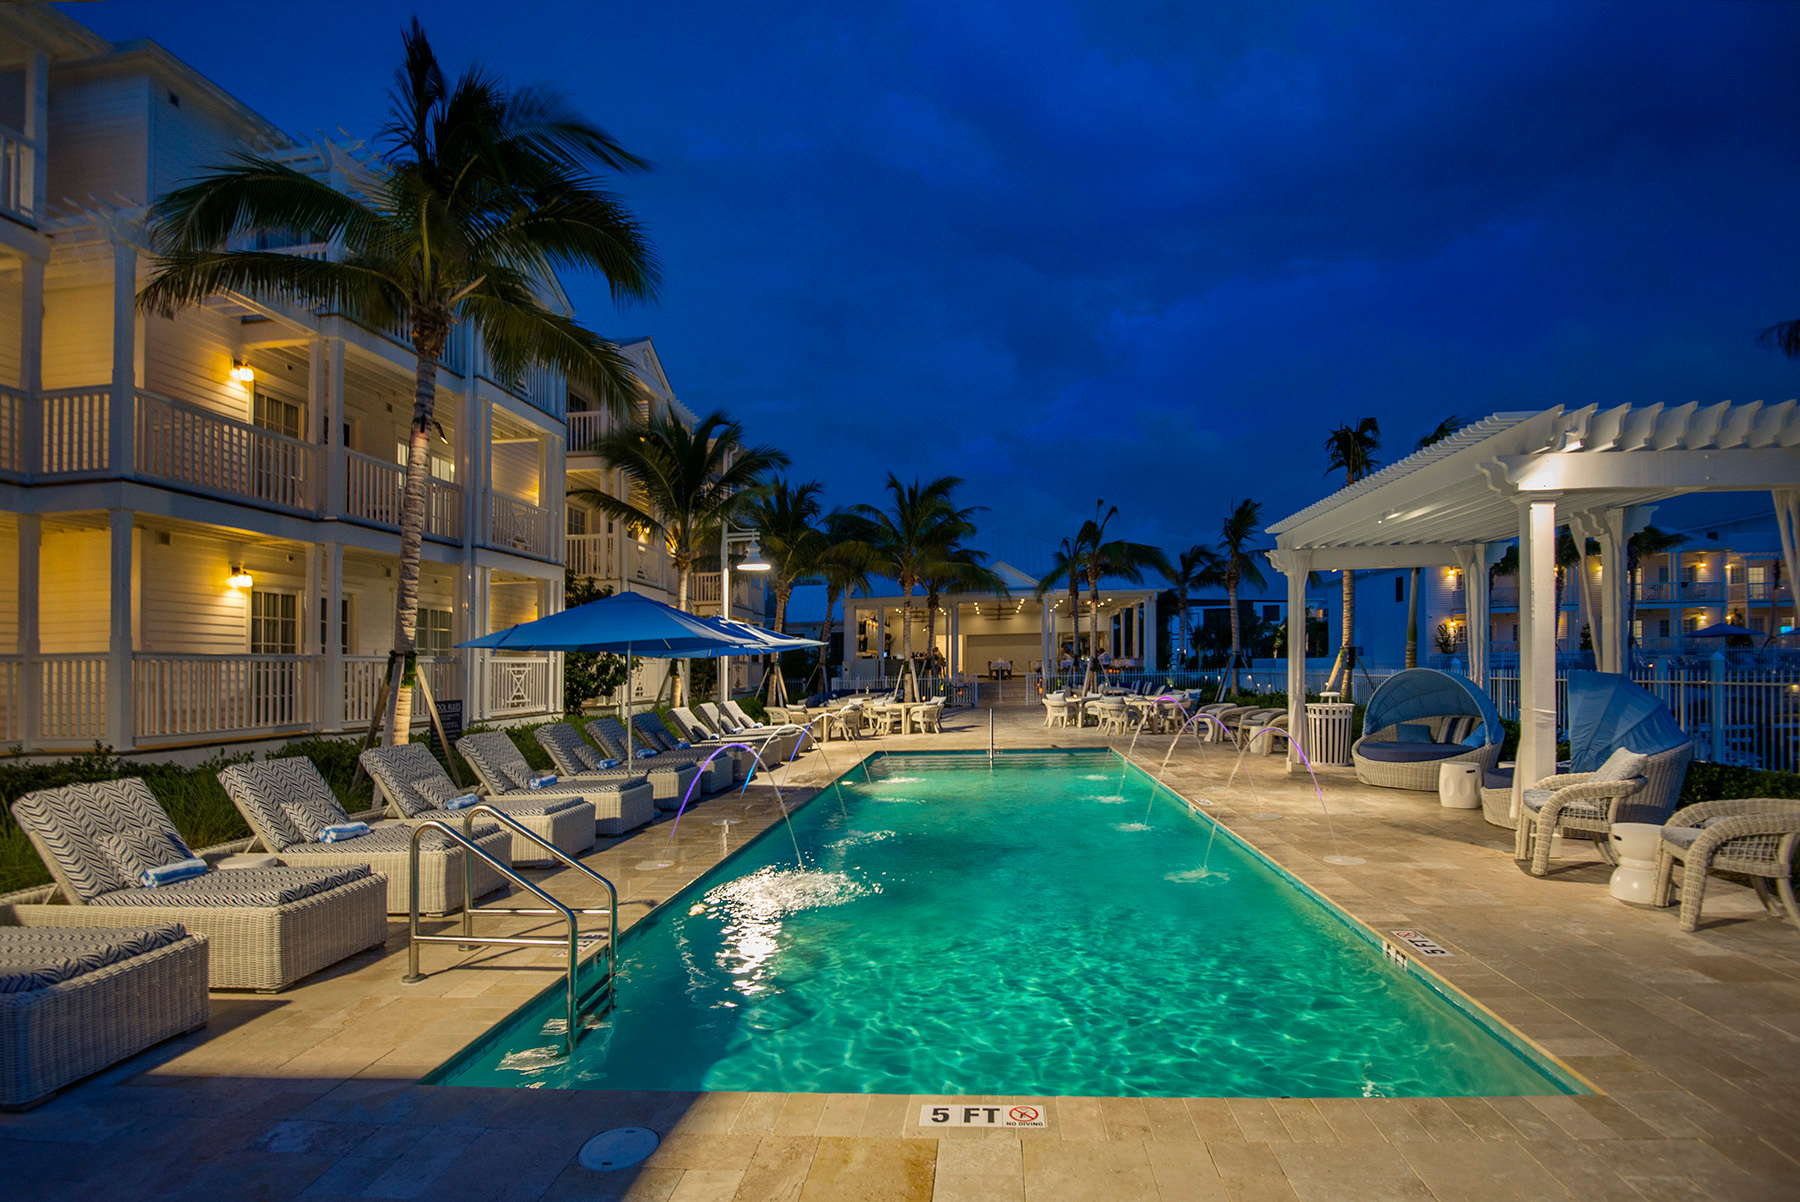 Oceans Edge Key West Hotel & Marina Expert Review | Fodor's Travel